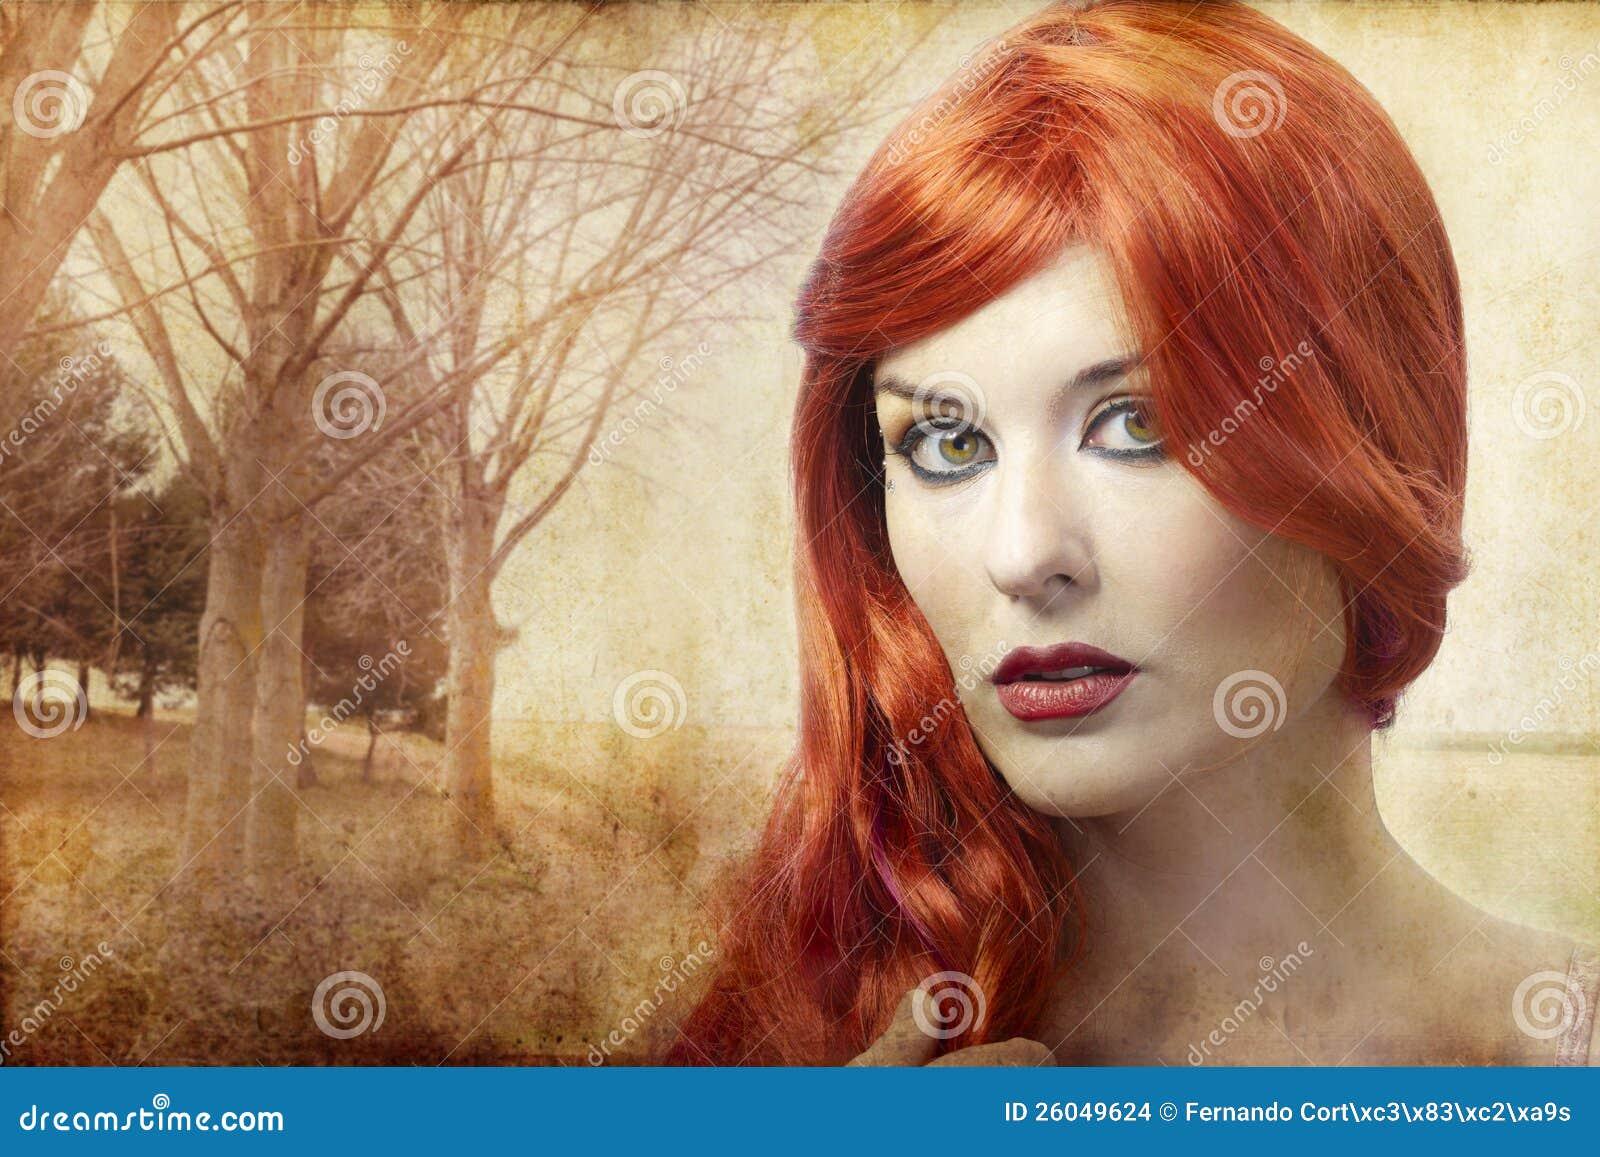 mulher-redheaded-bonita-renascimento-26049624.jpg